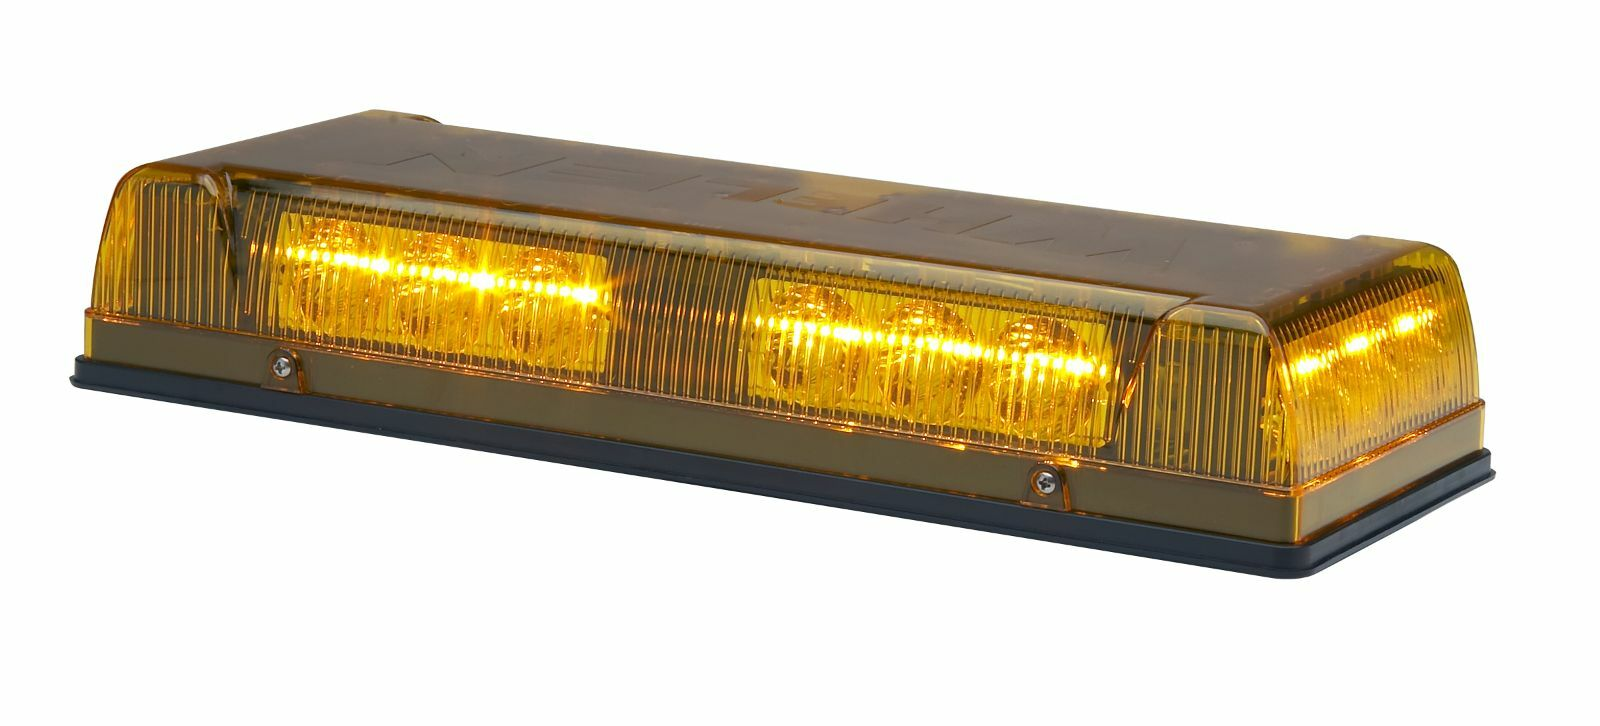 Whelen responder r1lppa led lightbar warning light amber picture 1 of 4 sciox Gallery